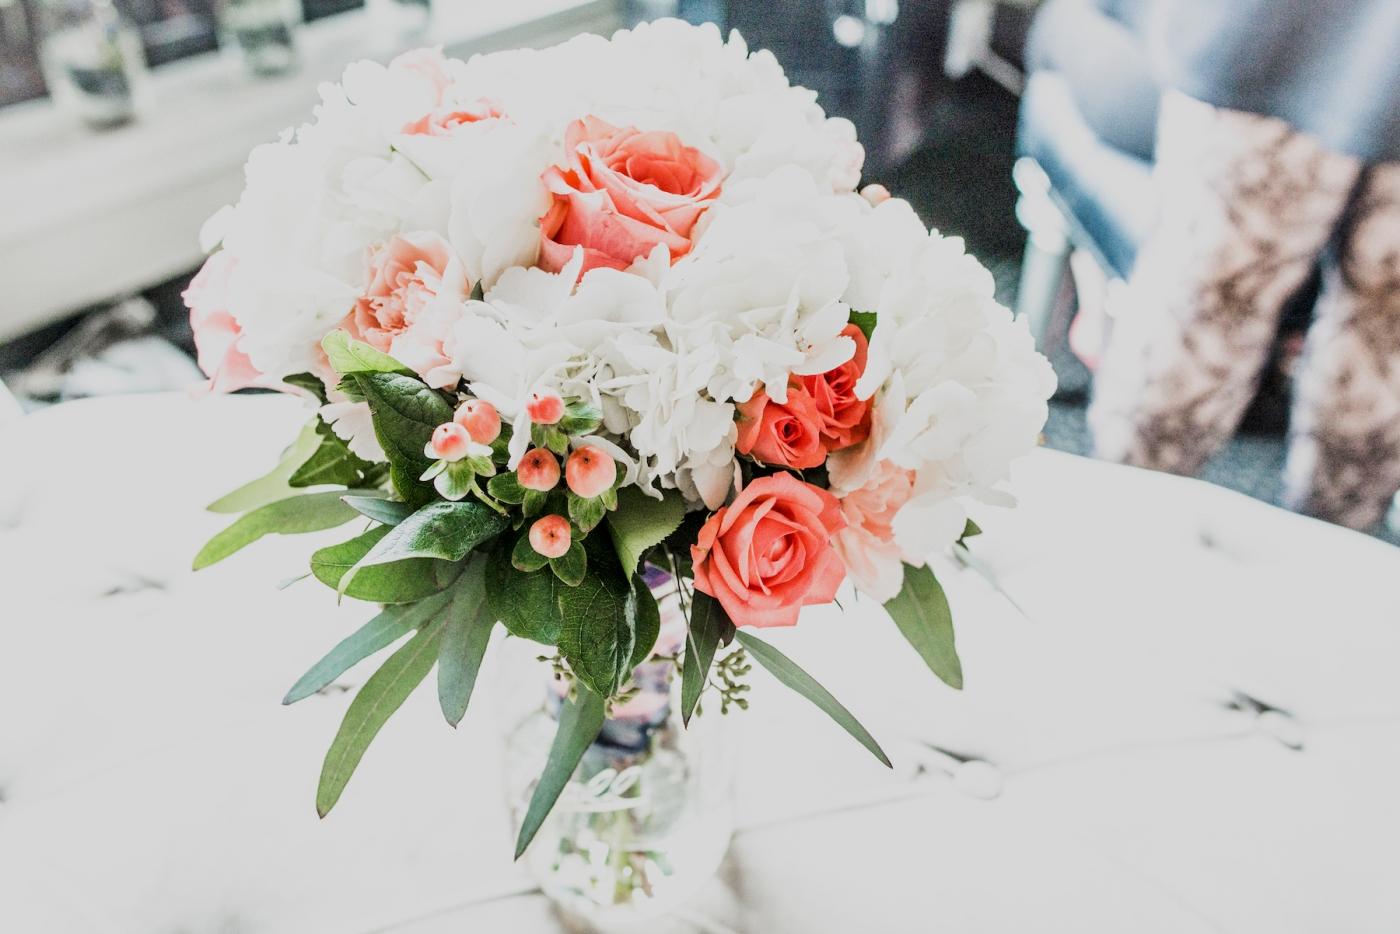 DSC_1802Everett_Wedding_Ballroom_Jane_Speleers_photography_Rachel_and_Edmund_Getting_ready_2017